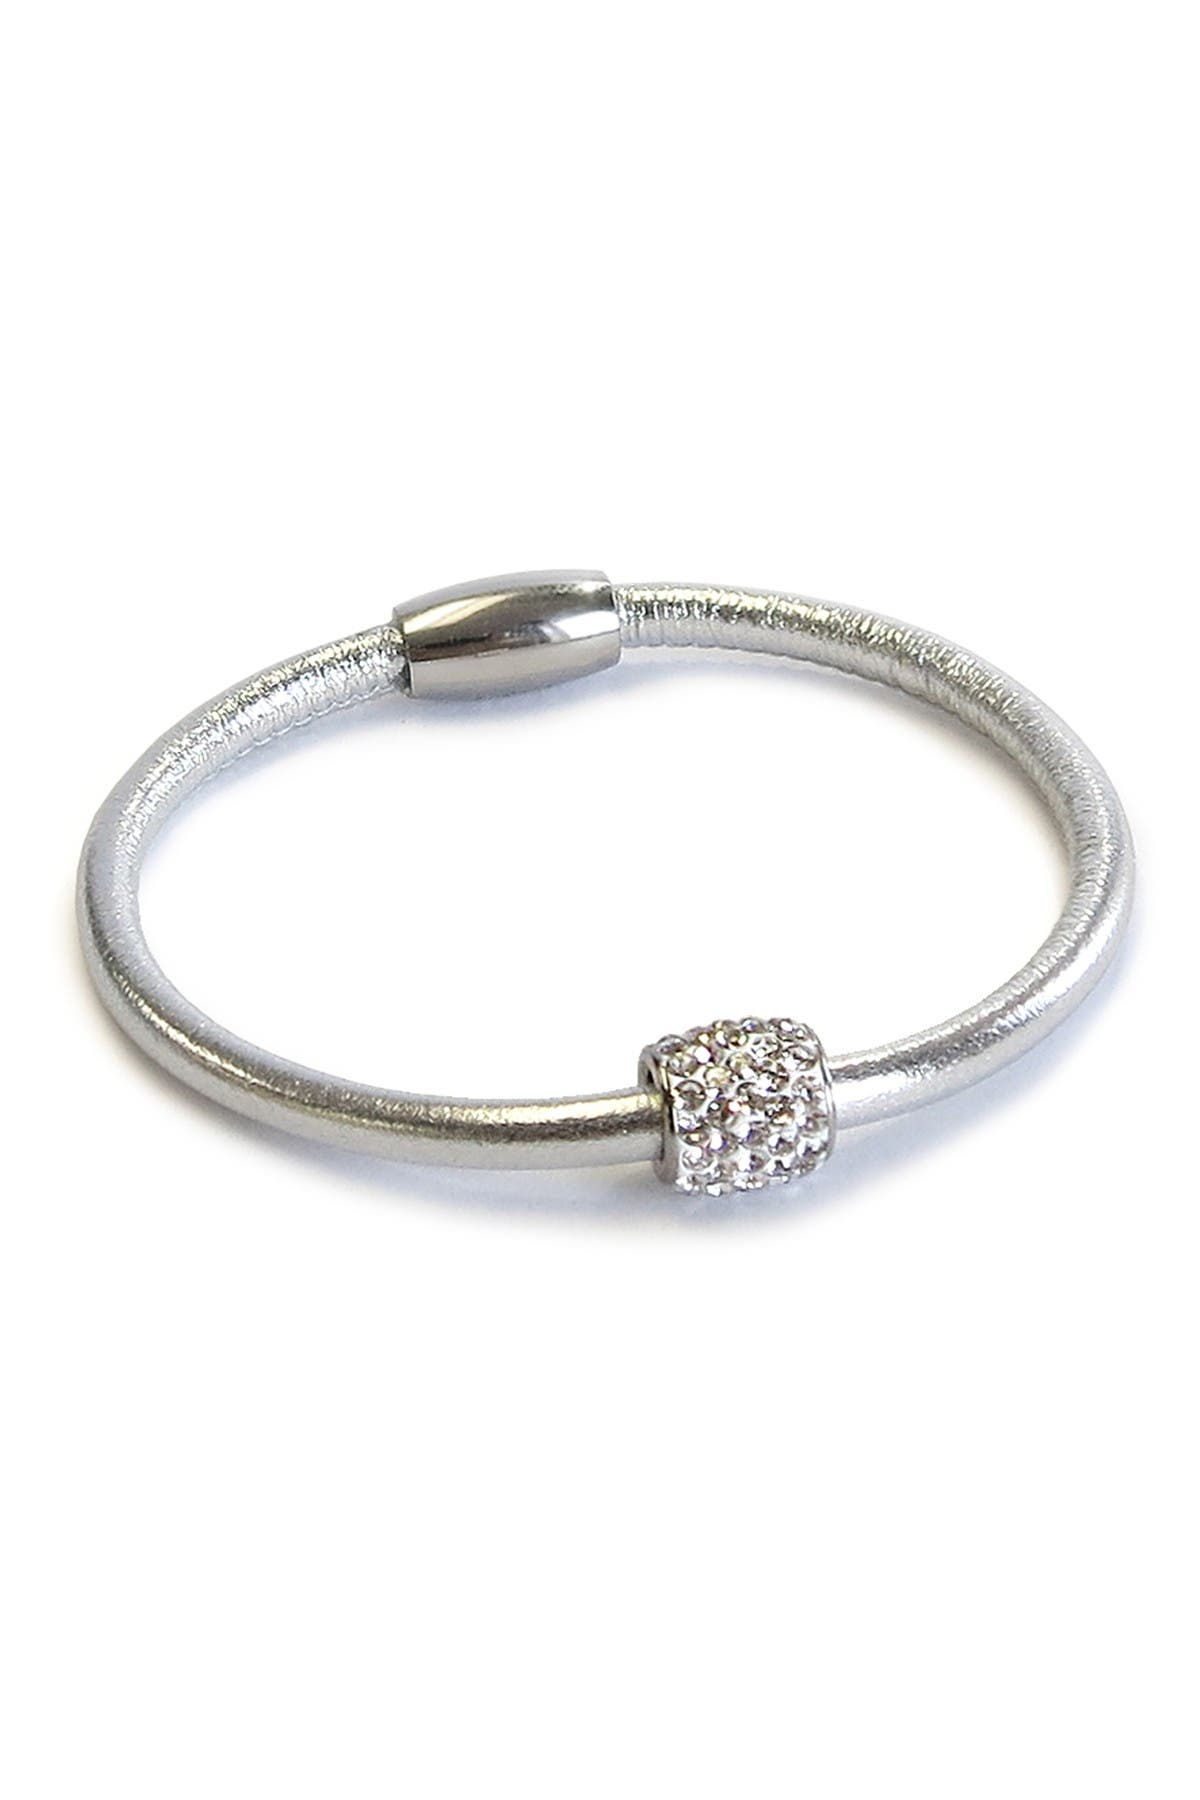 Image of Liza Schwartz Sterling Silver Pave CZ Metallic Leather Bracelet